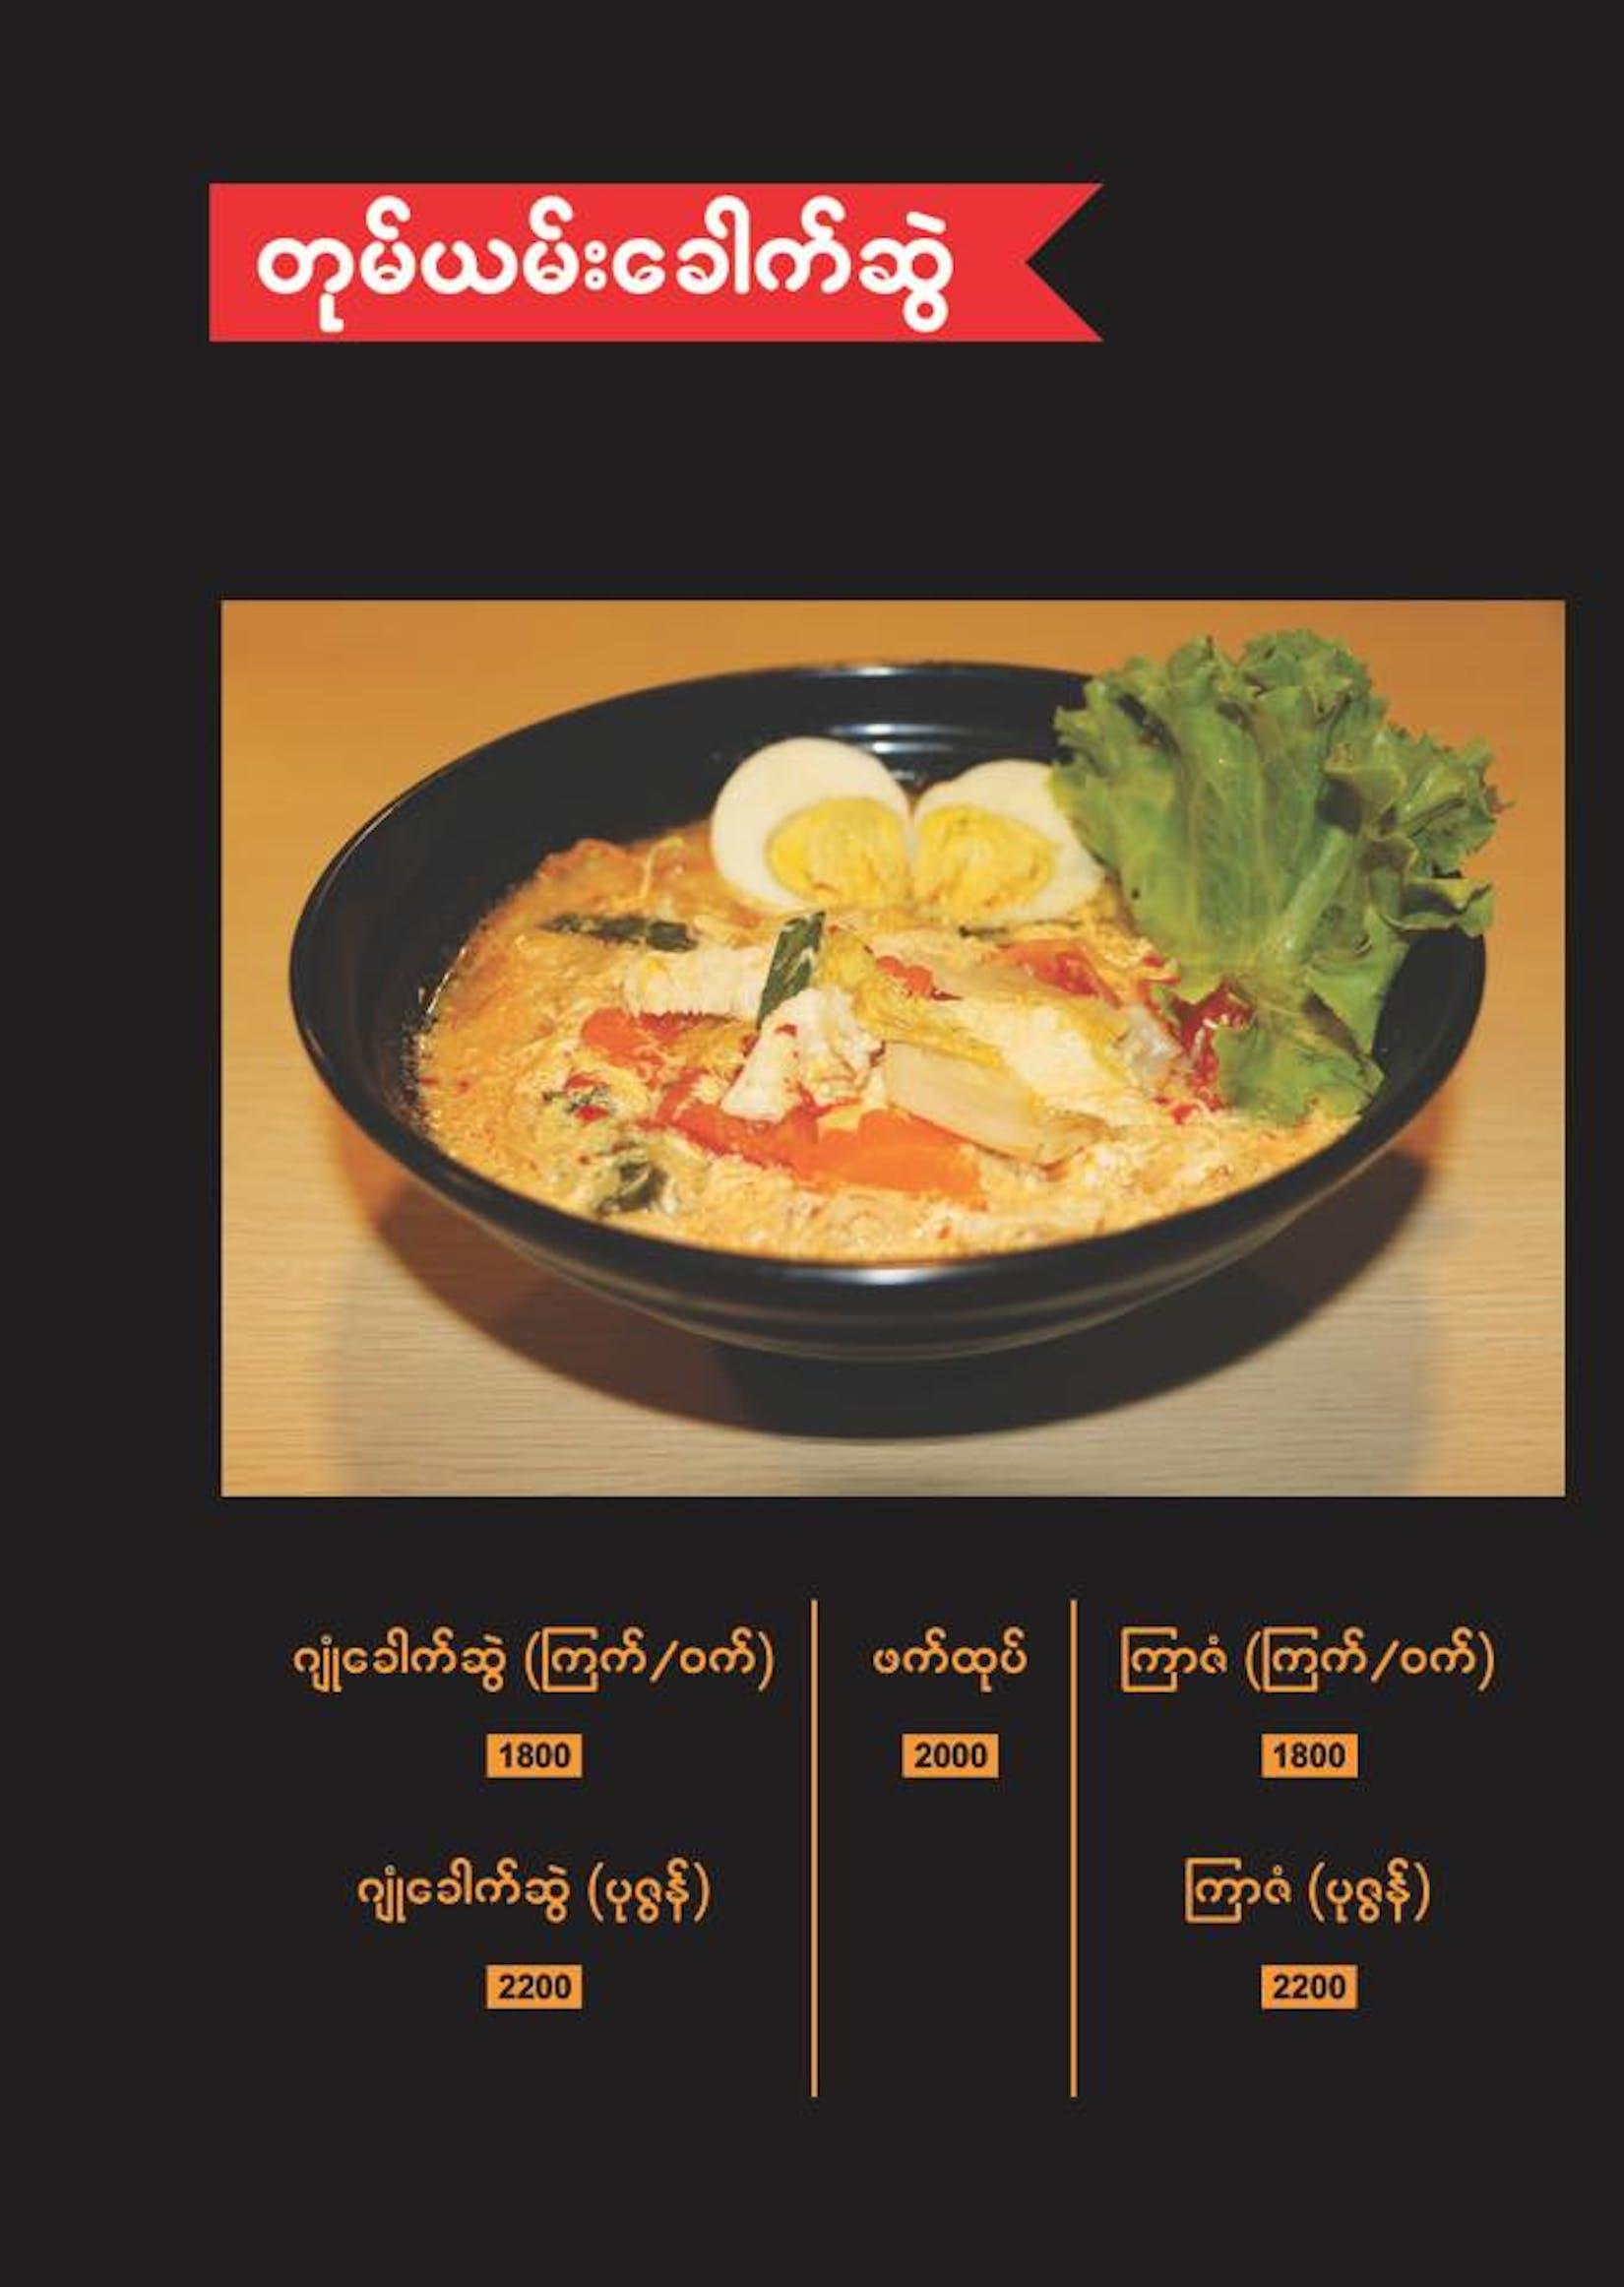 Doe Yoe Yar Food Village | yathar